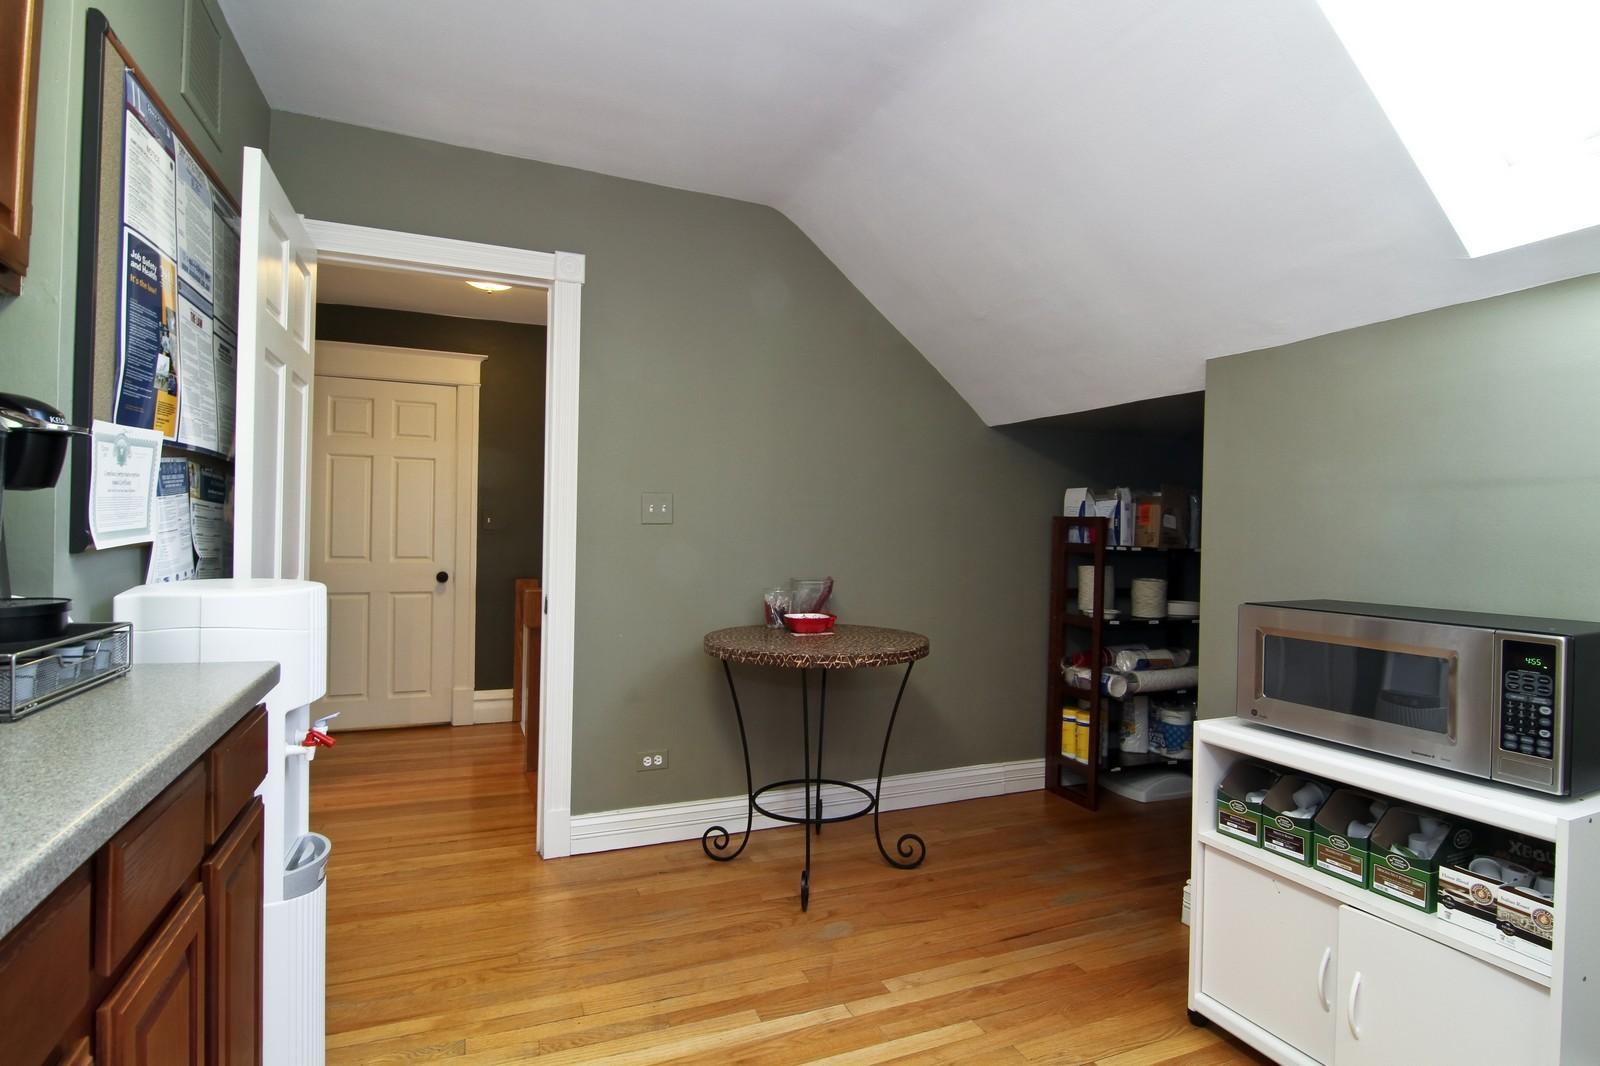 Real Estate Photography - 310 S Hale St, Wheaton, IL, 60187 - Location 9